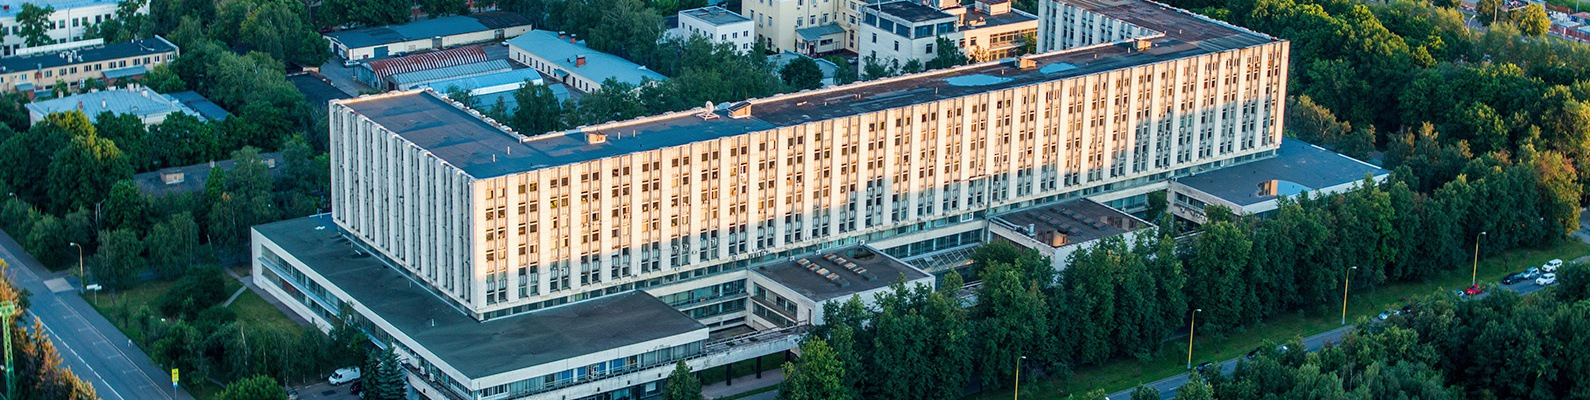 Факультет ВМК МГУ